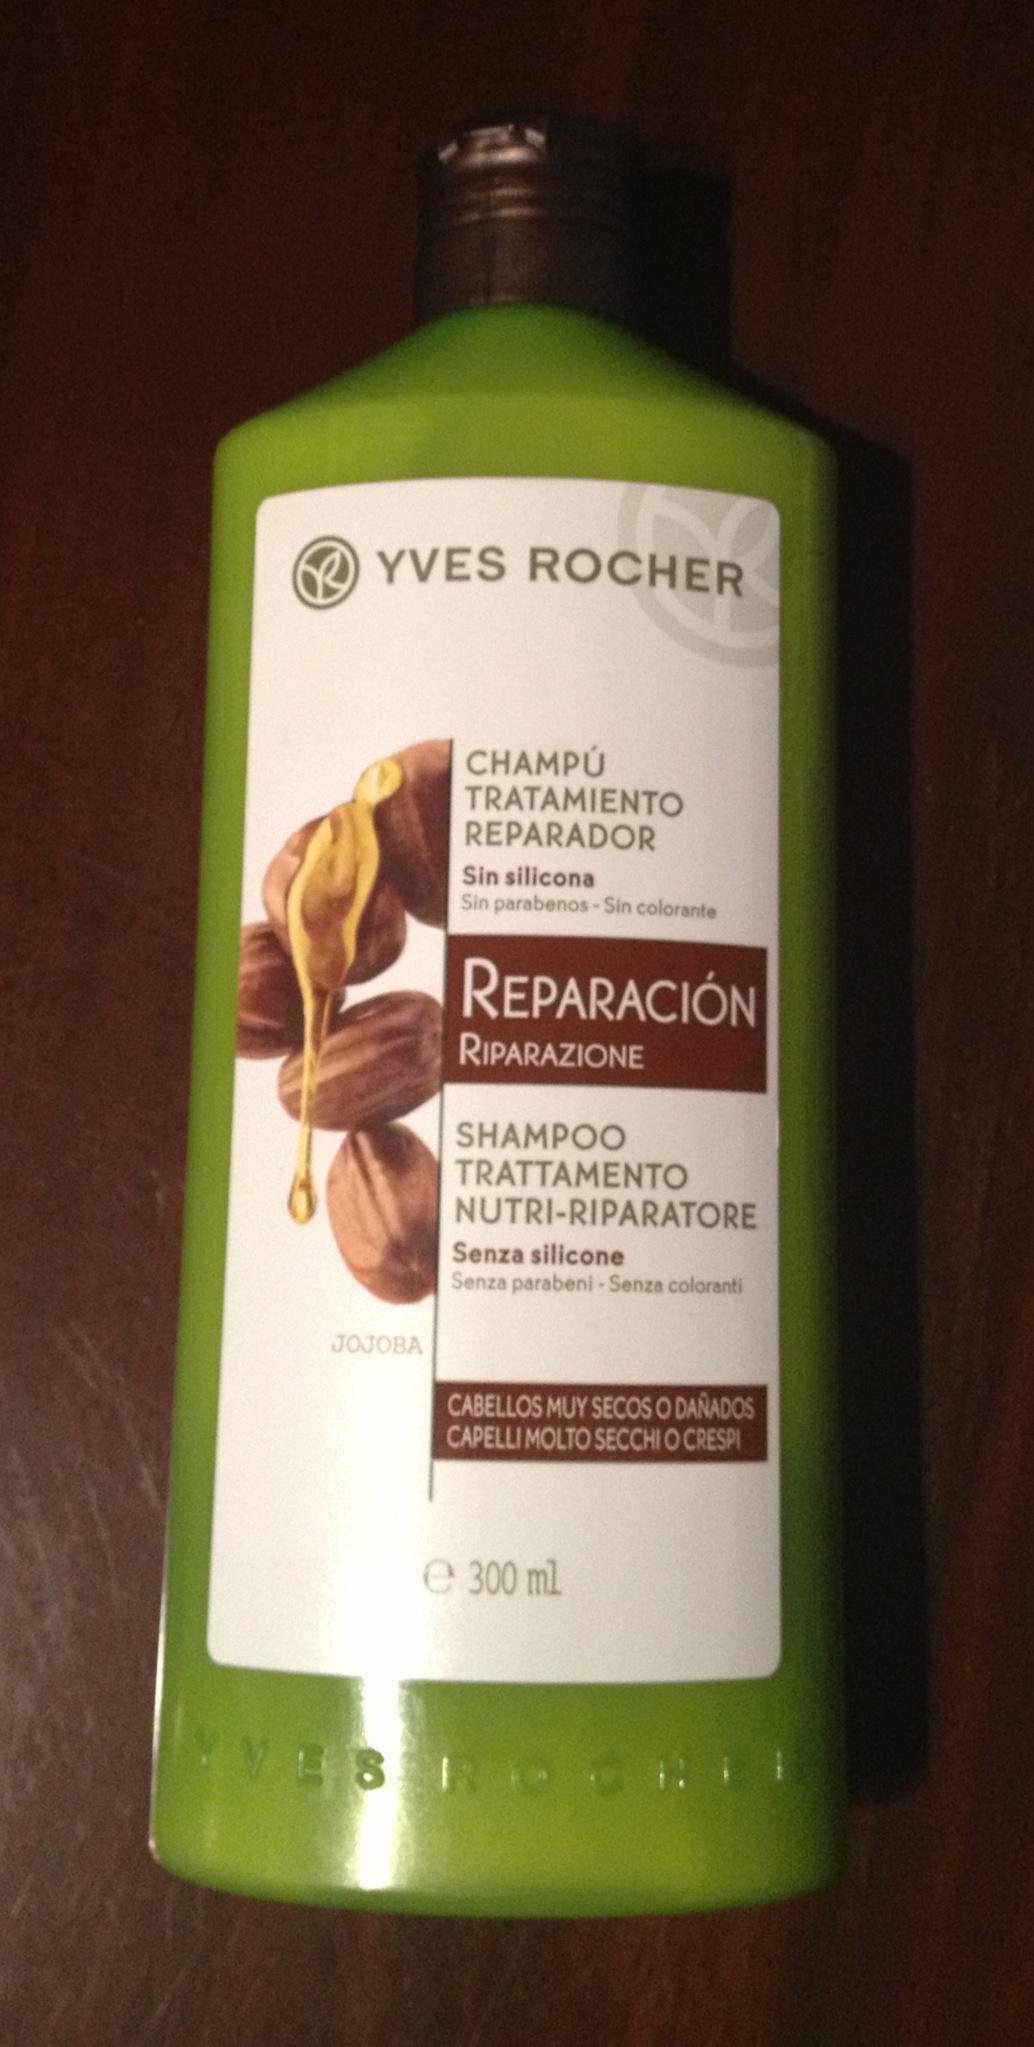 Yves Rocher shampoo trattamento nutri riparatore